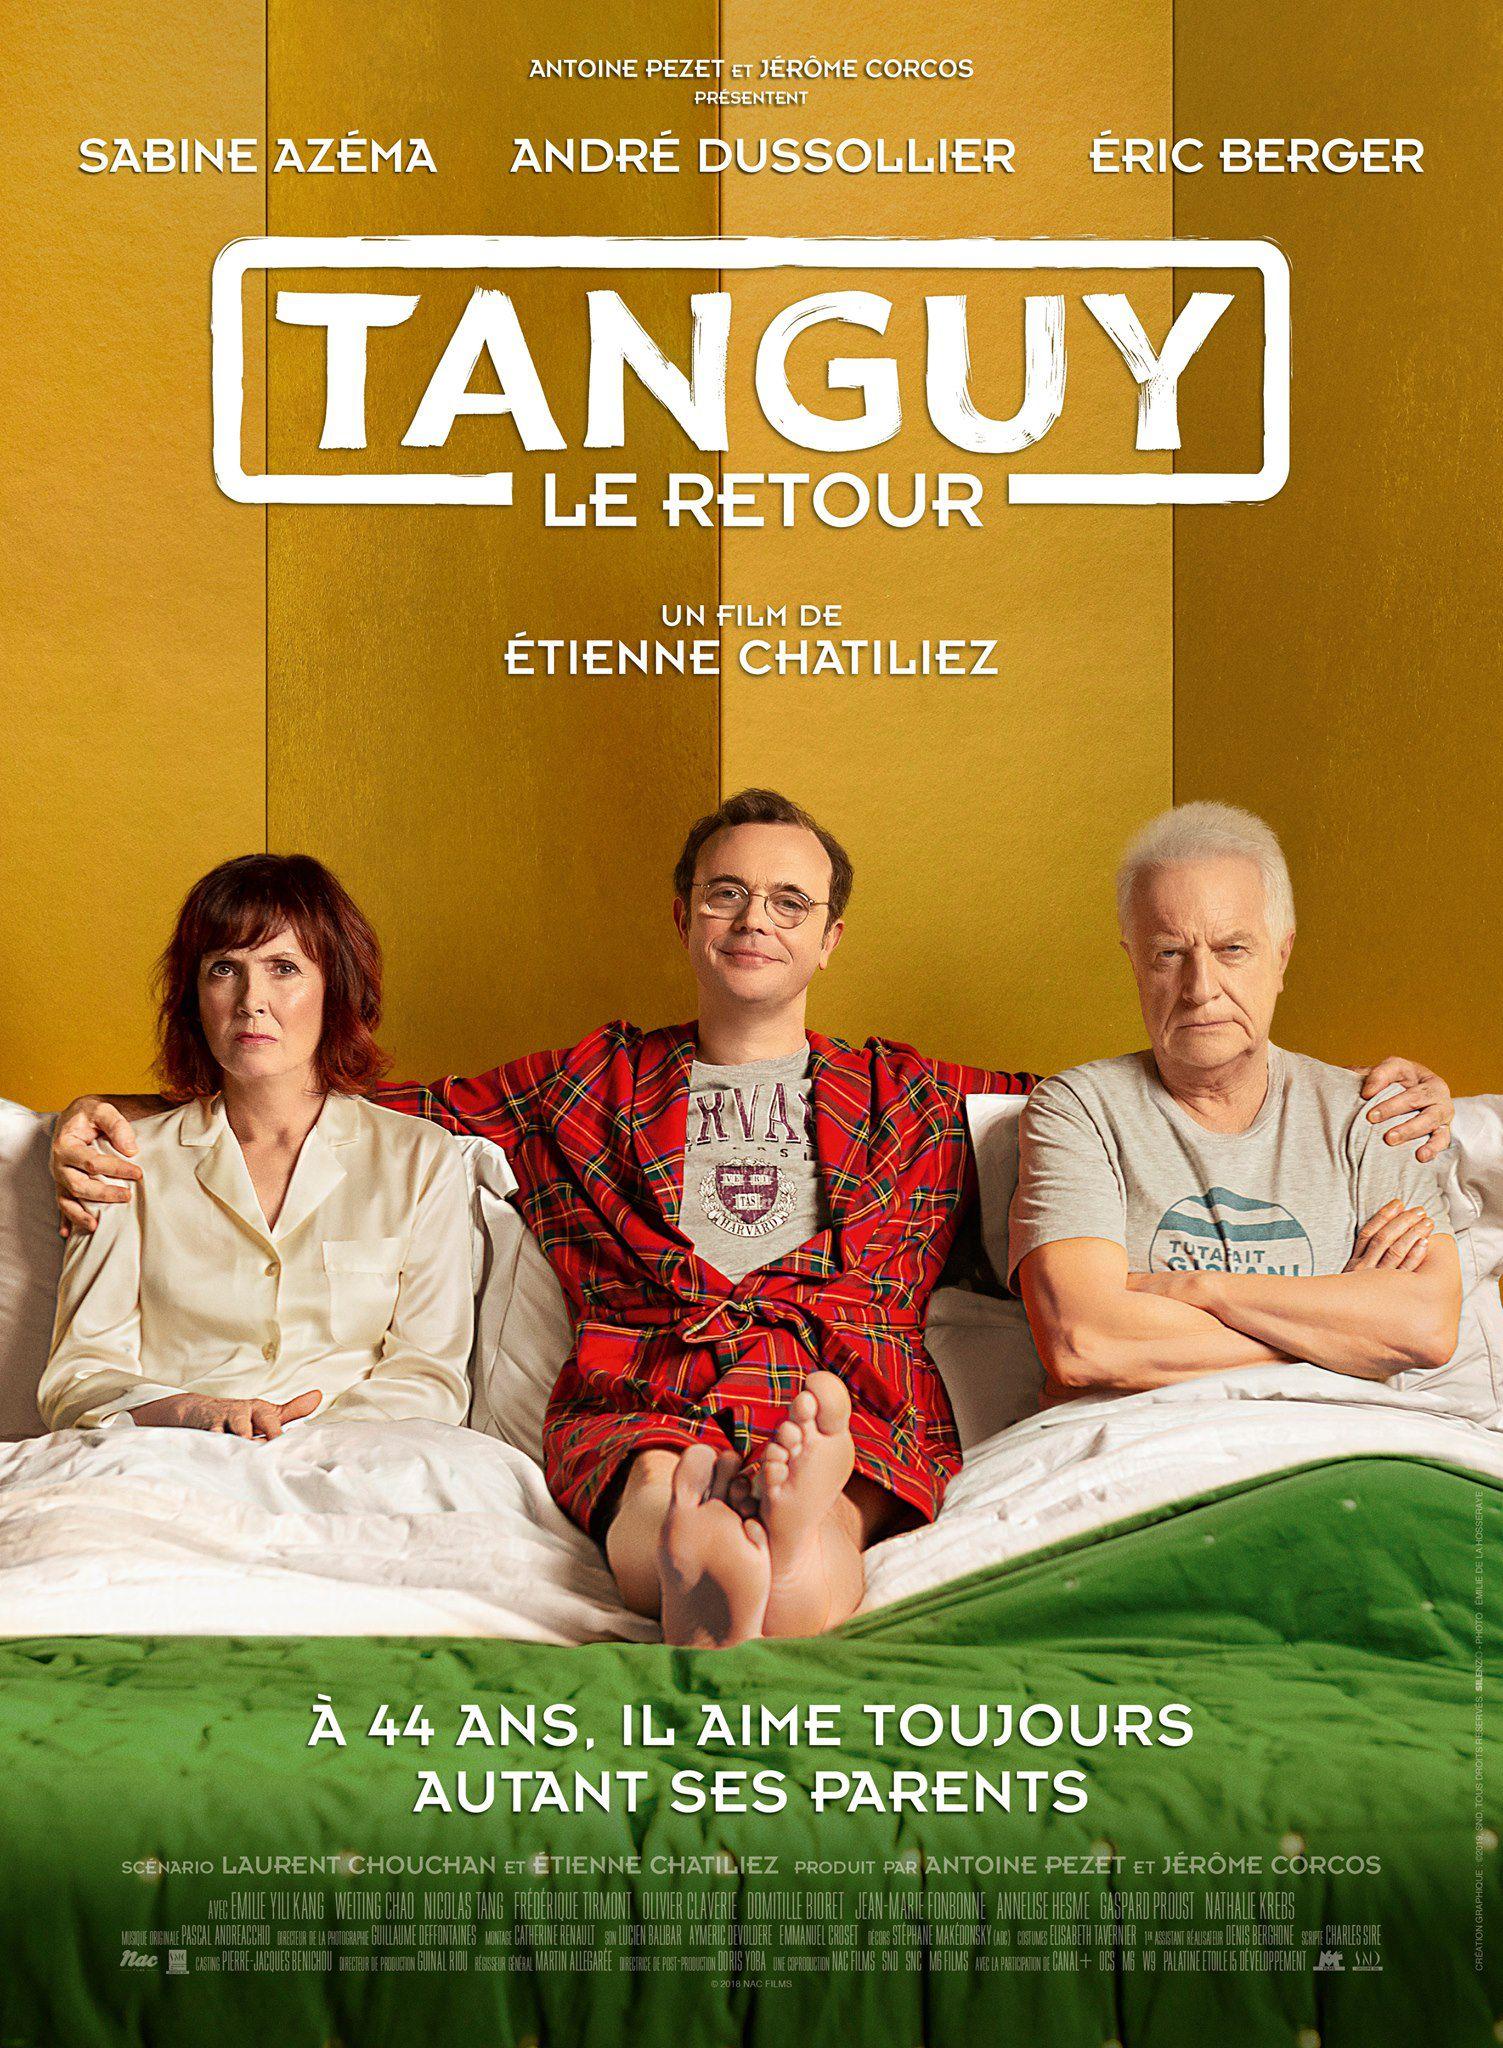 Tanguy, le retour - Film (2019)